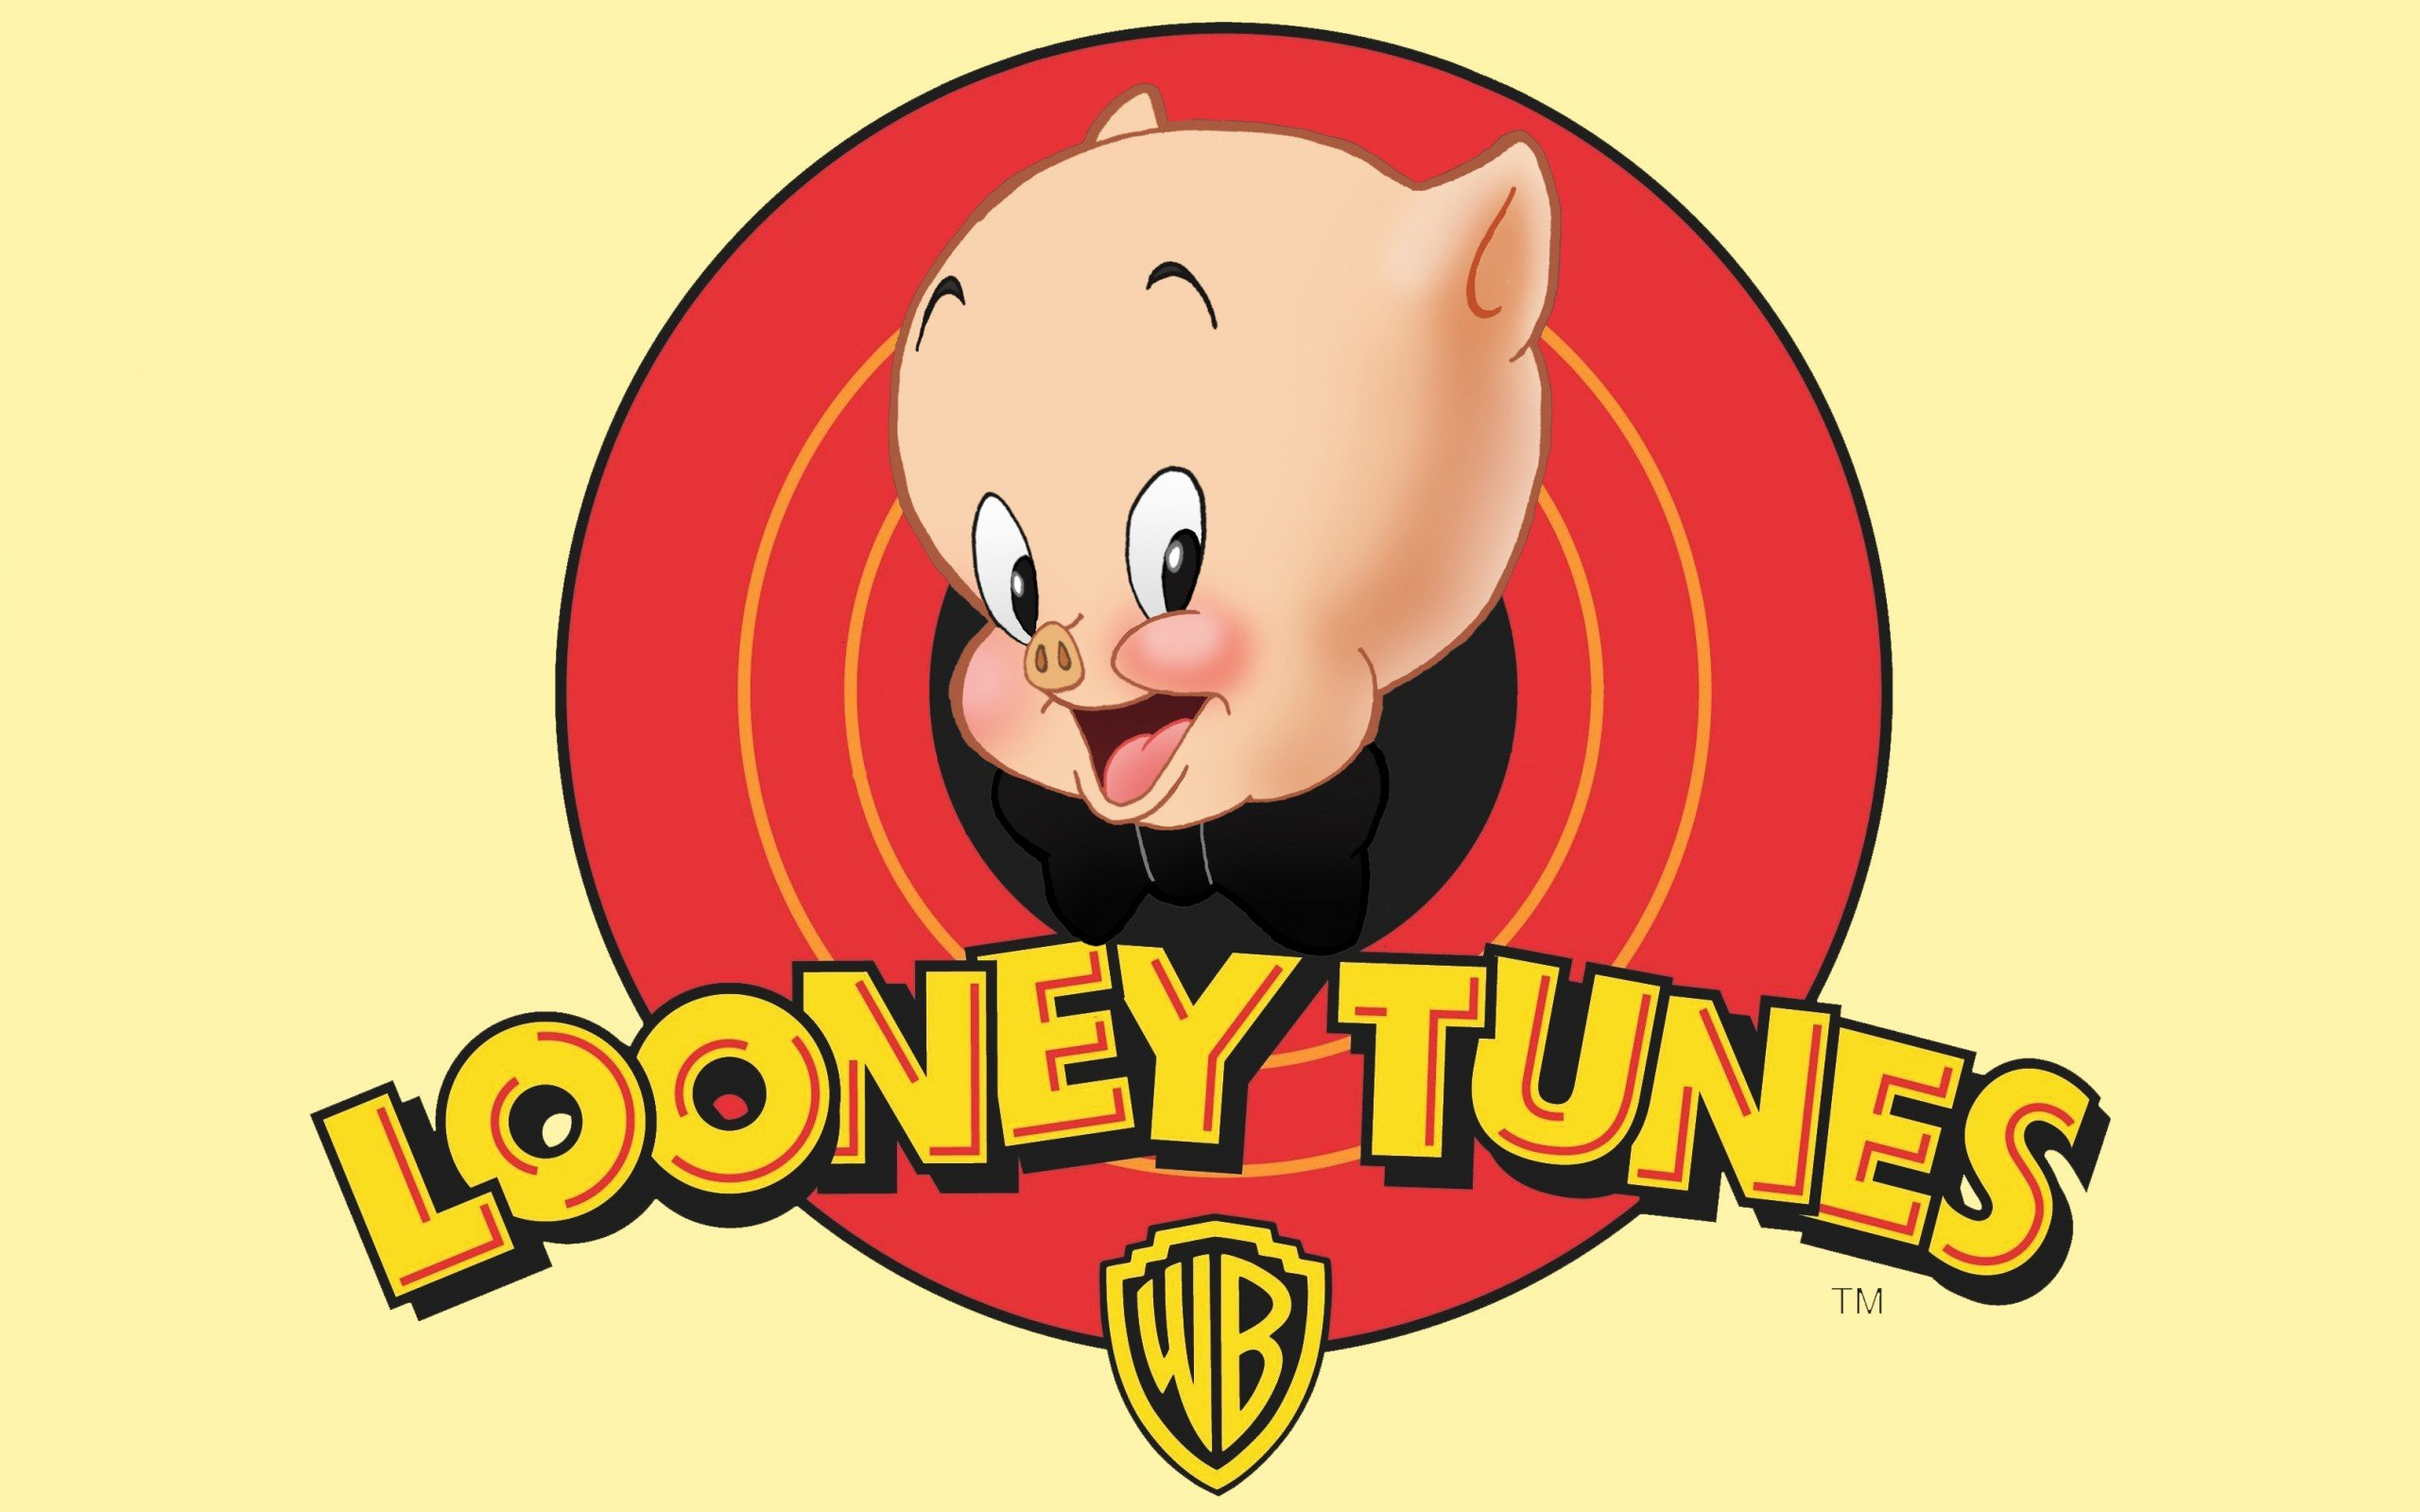 Looney Tunes Wallpapers Hd For Desktop Backgrounds